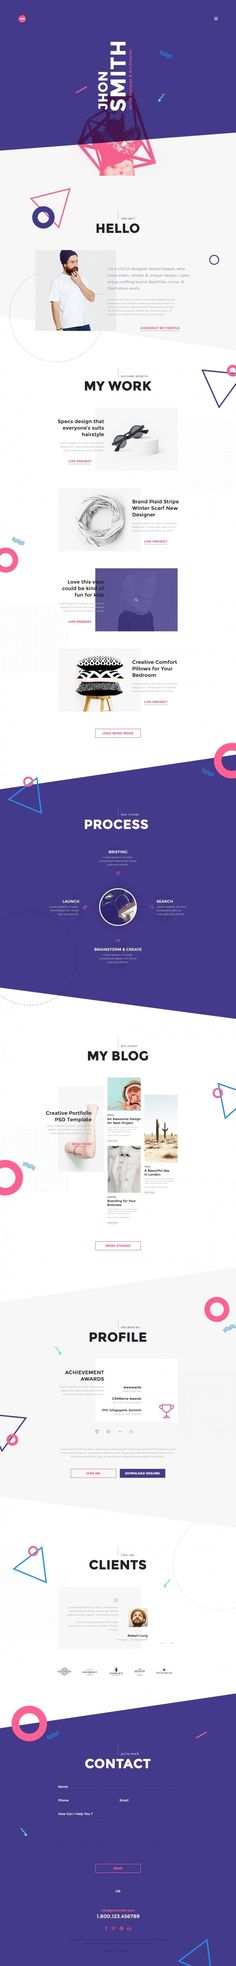 Me – Creative Portfolio & Resume / CV in Web design